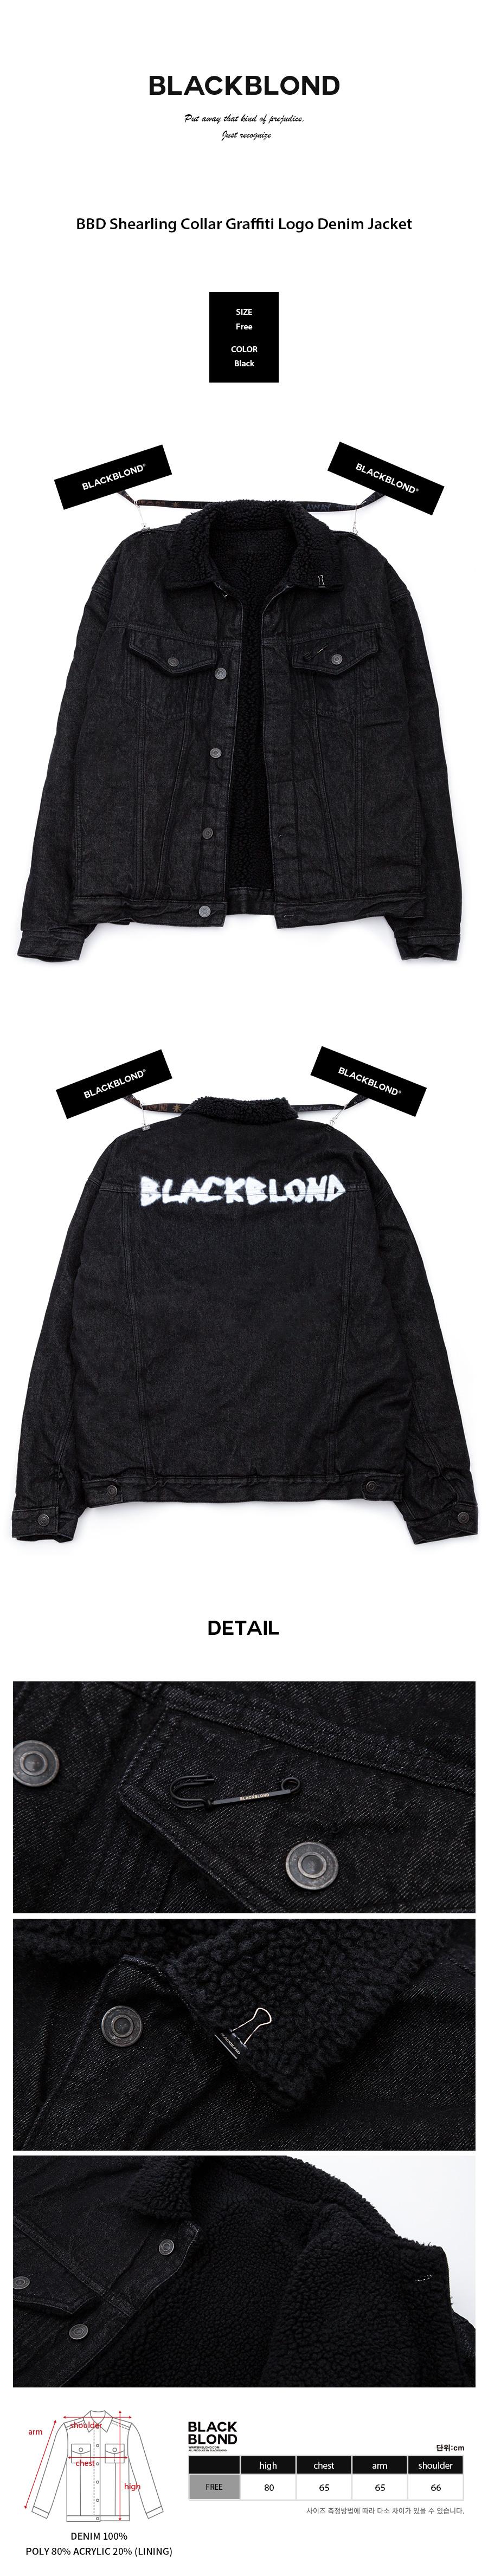 BBD-Shearling-Collar-Graffiti-Logo-Denim-Jacket-%28Black%29.jpg